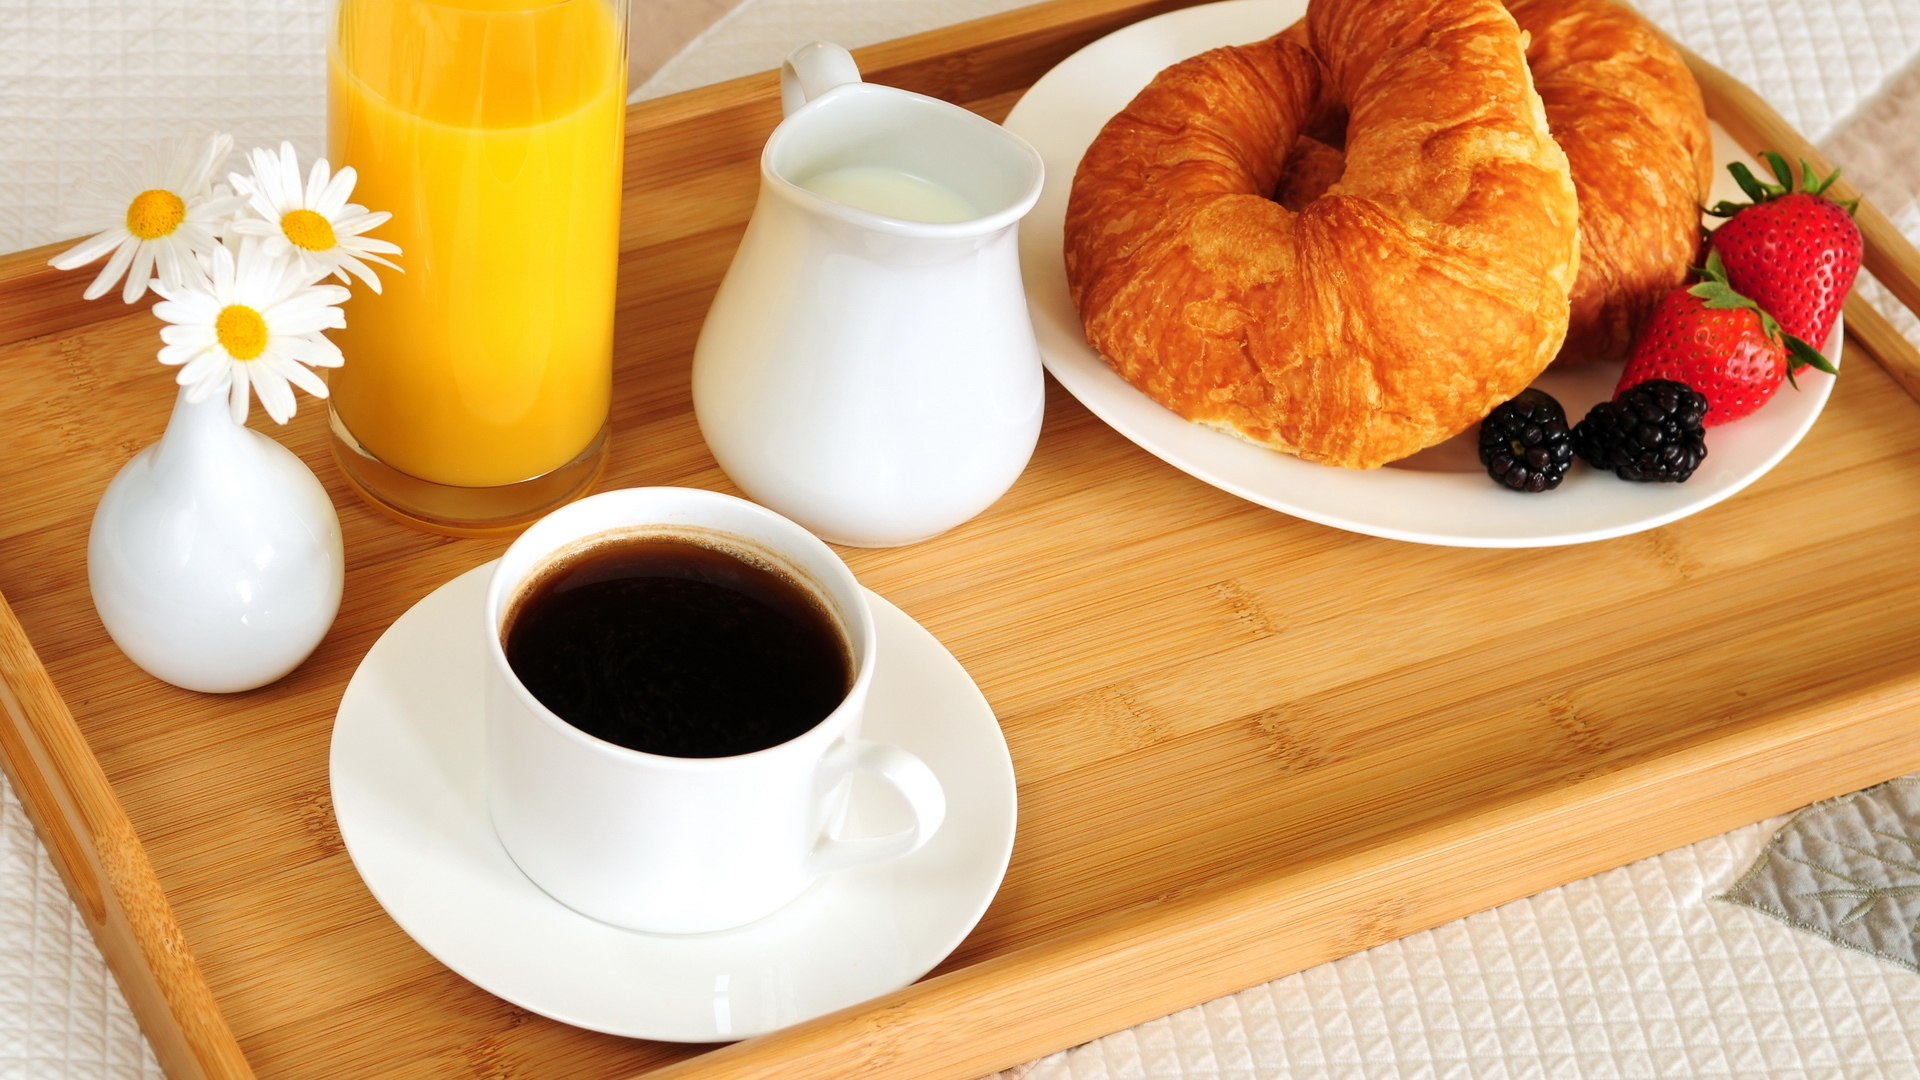 Quante calorie bisogna assumere a colazione?